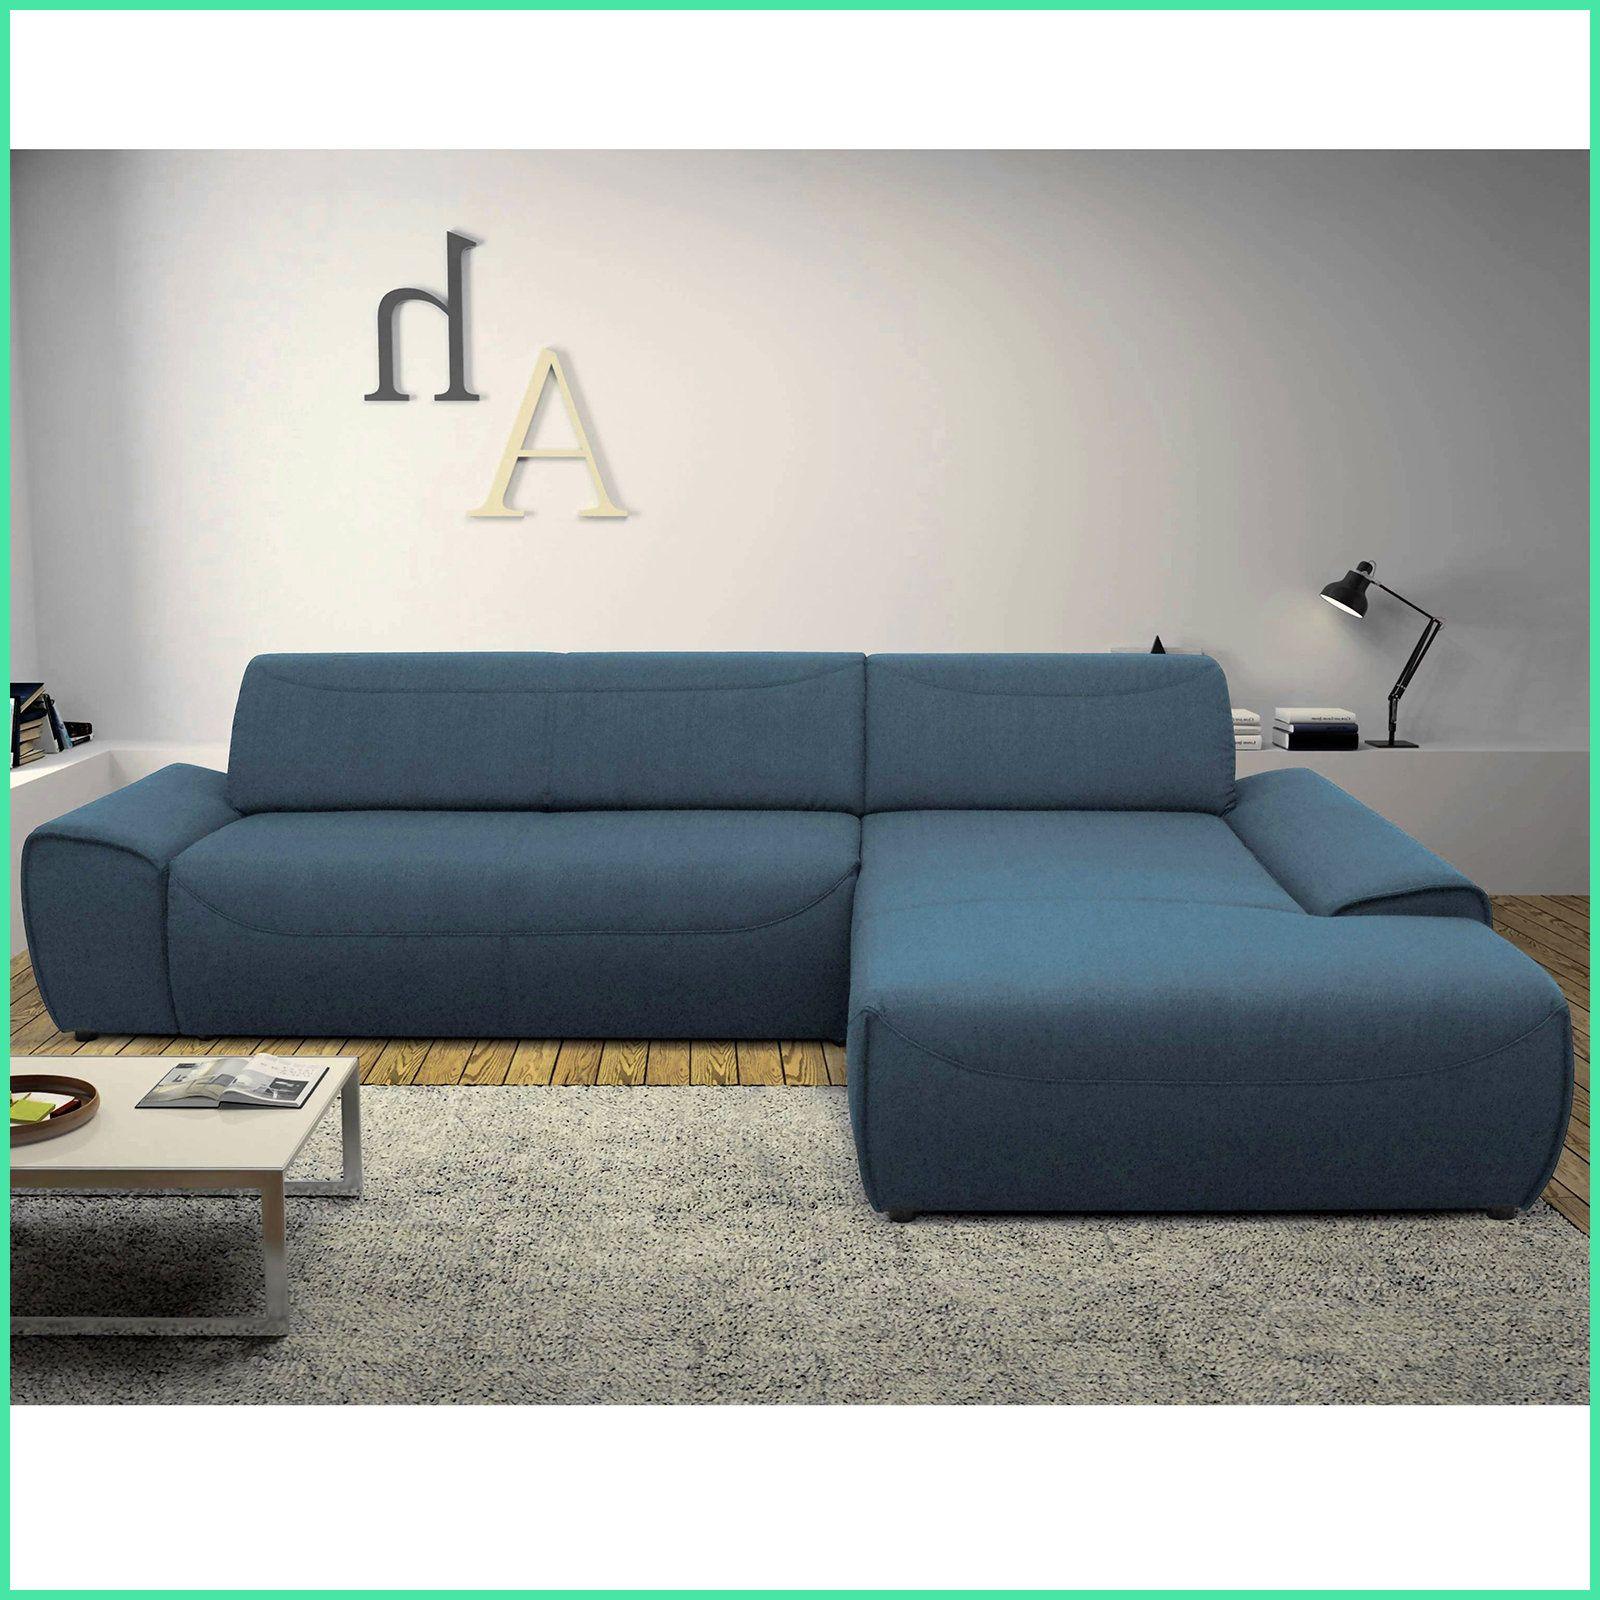 15 Erstaunlich Schlafcouch Otto Sofa Couch Home Decor Couch